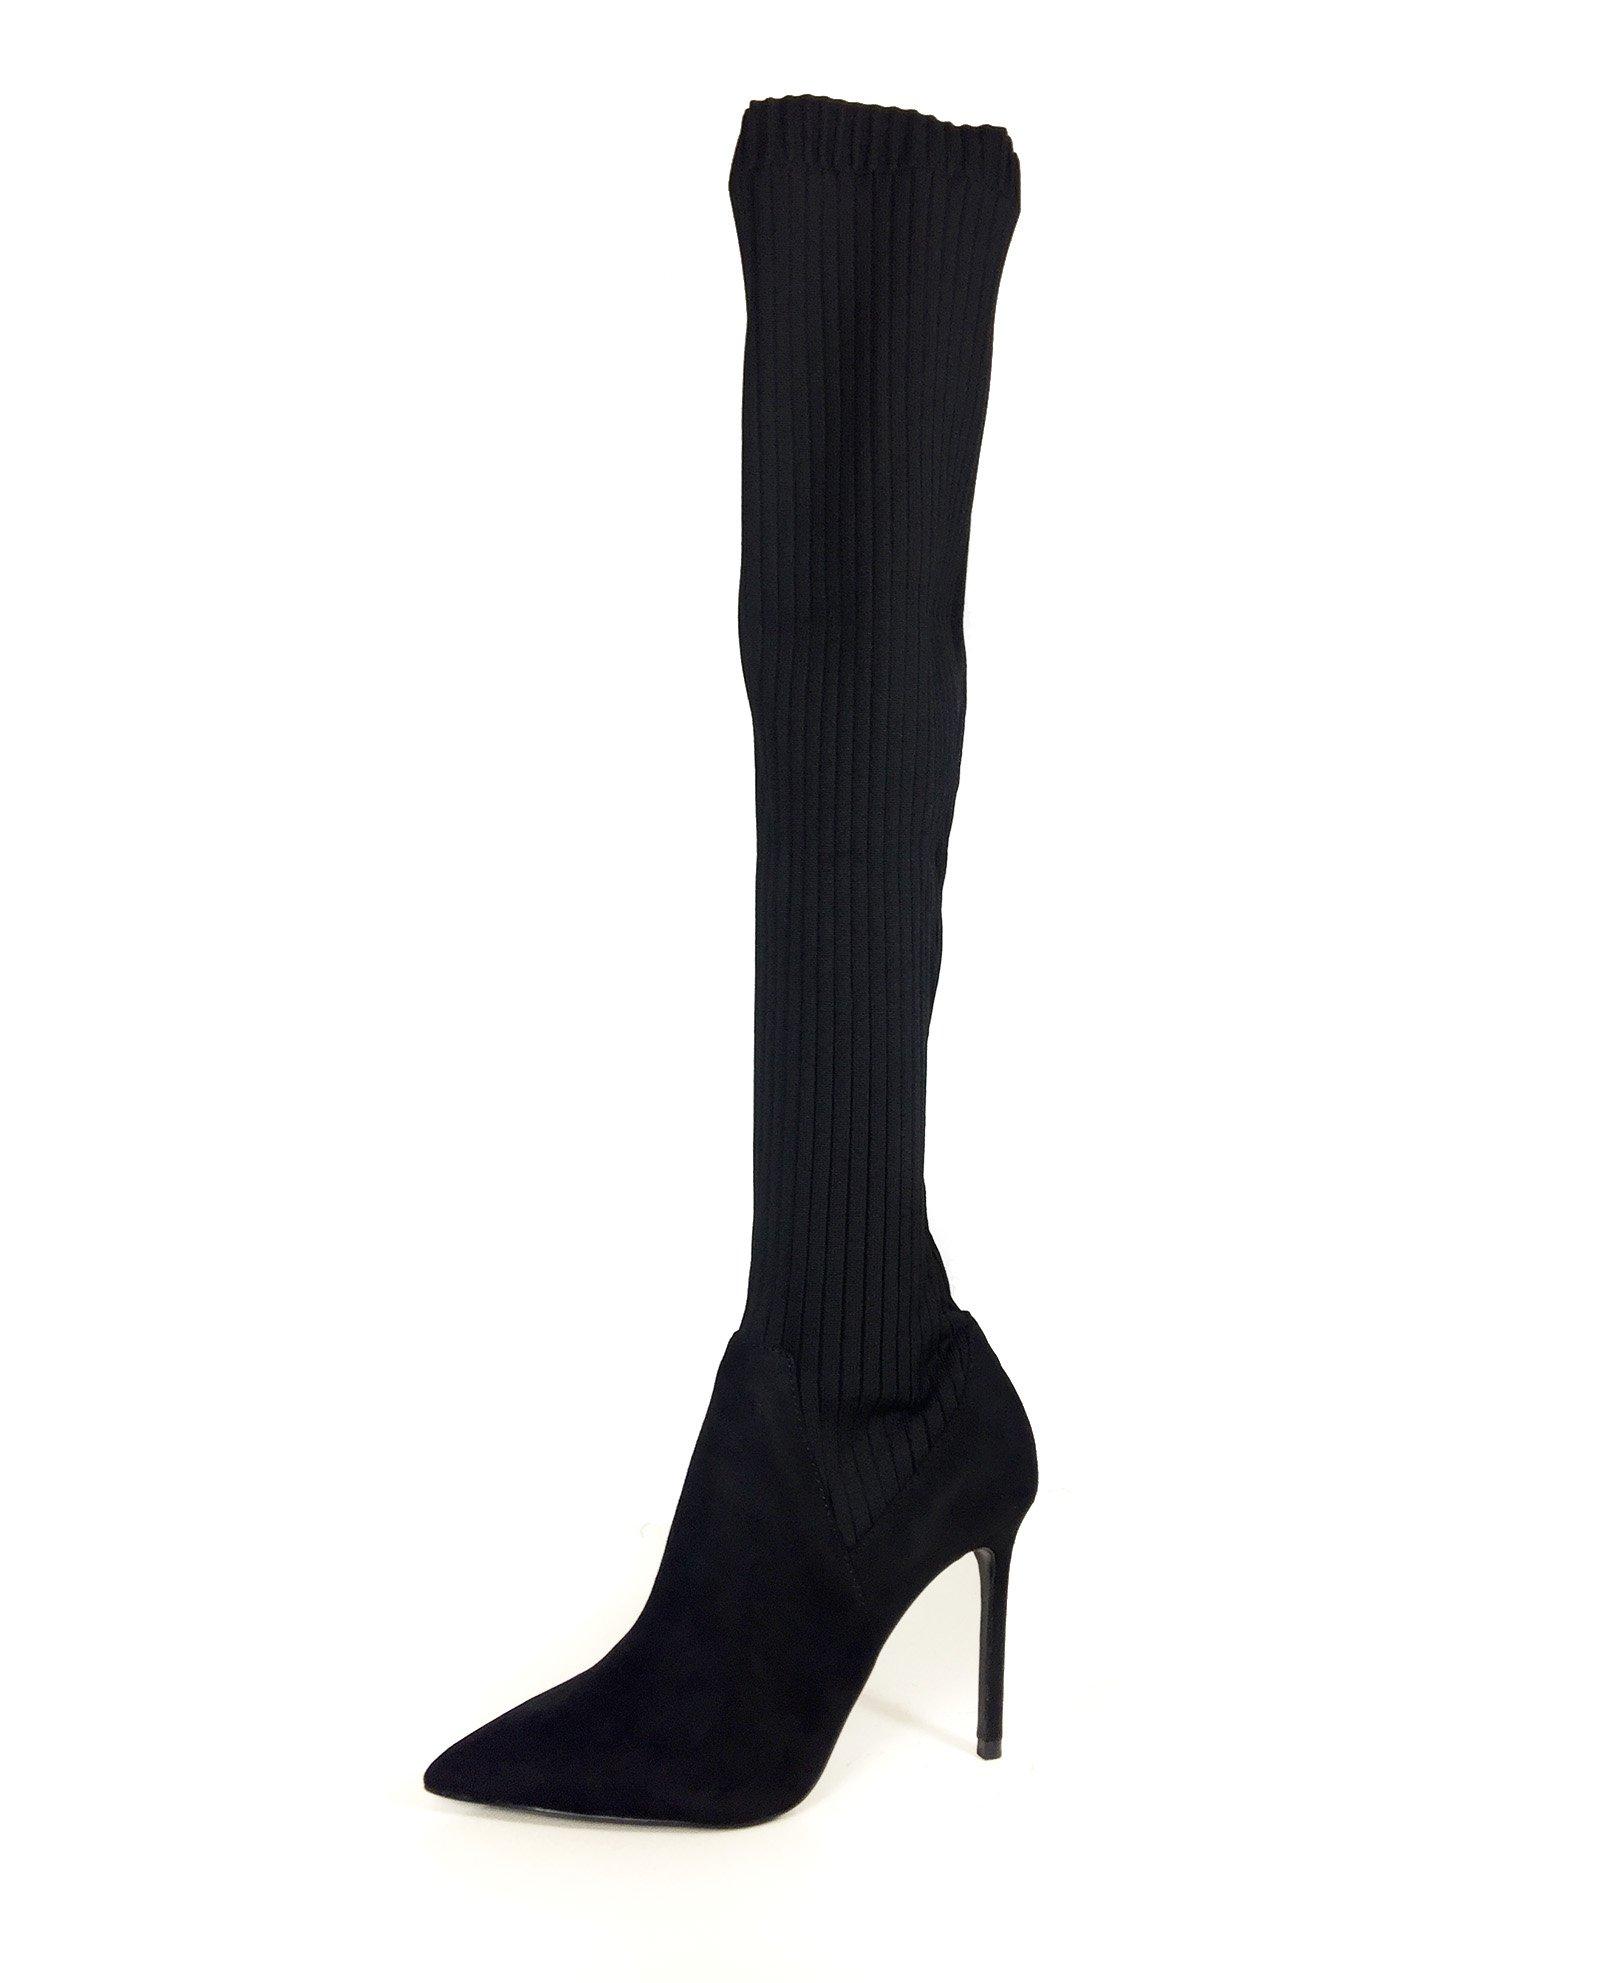 Zara Women Sock-style high heel boots 6018/201 (39 EU   8 US   6 UK)